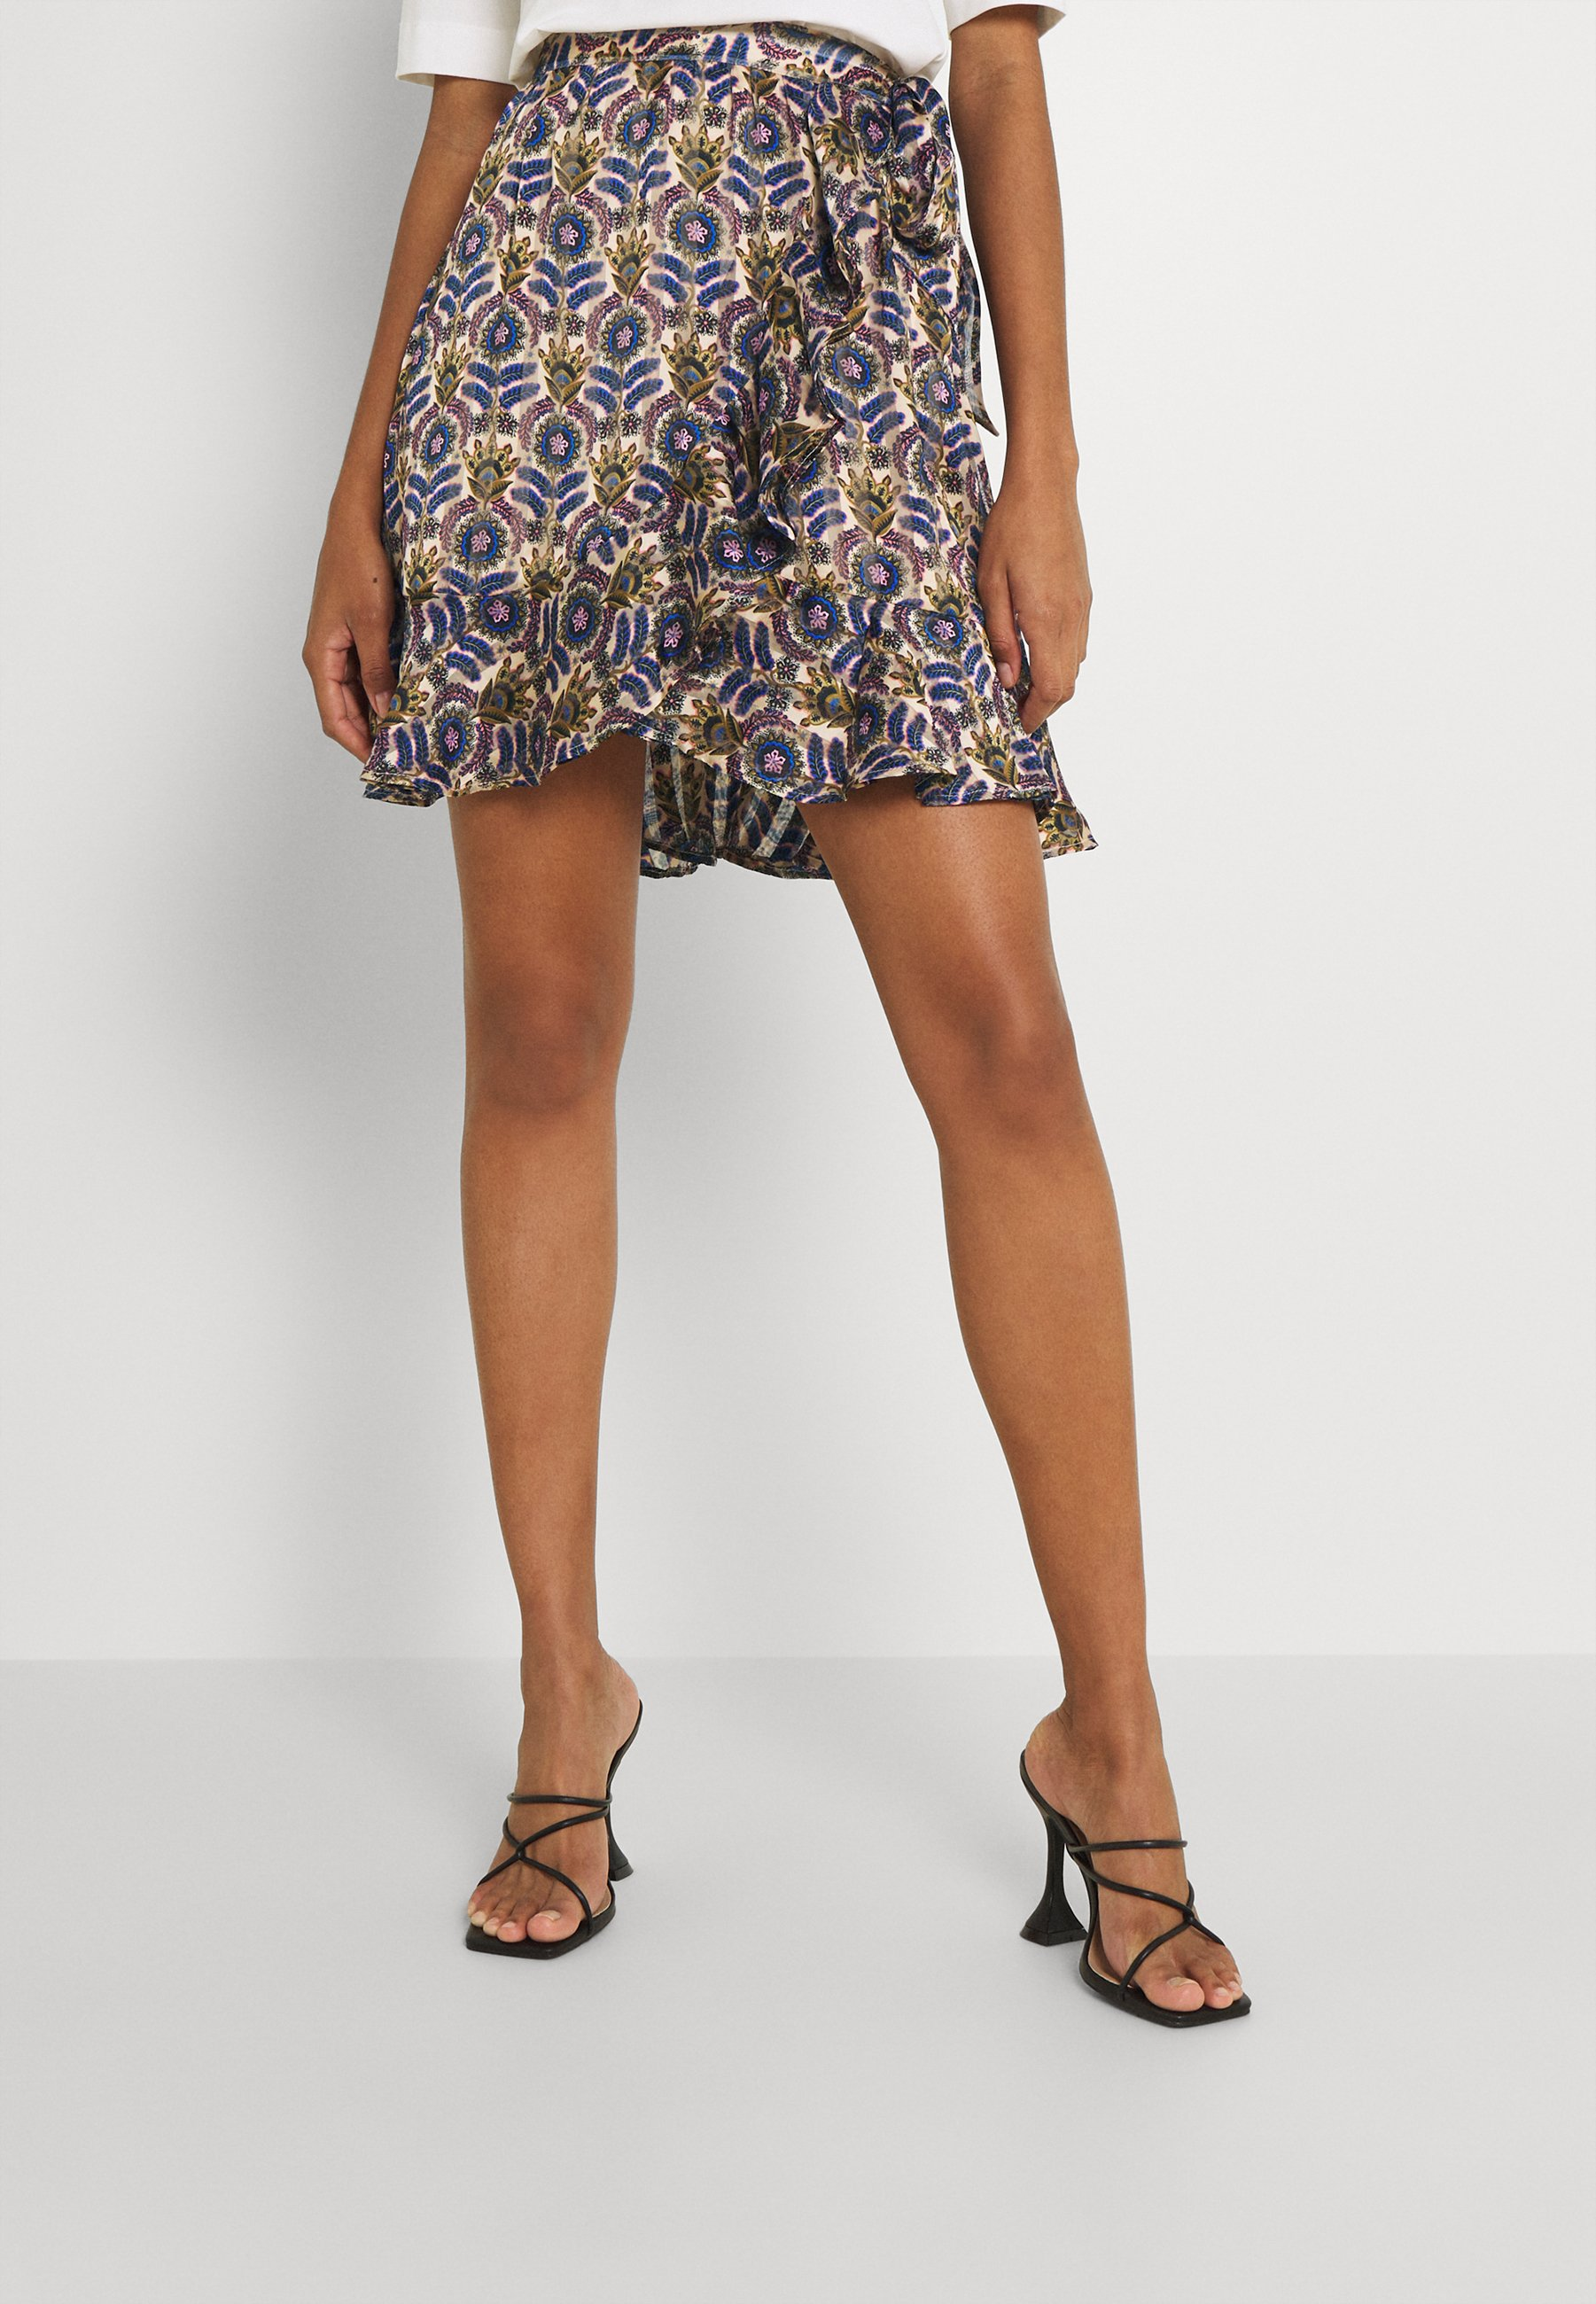 Femme PRINTED WRAP OVER SKIRT - Minijupe